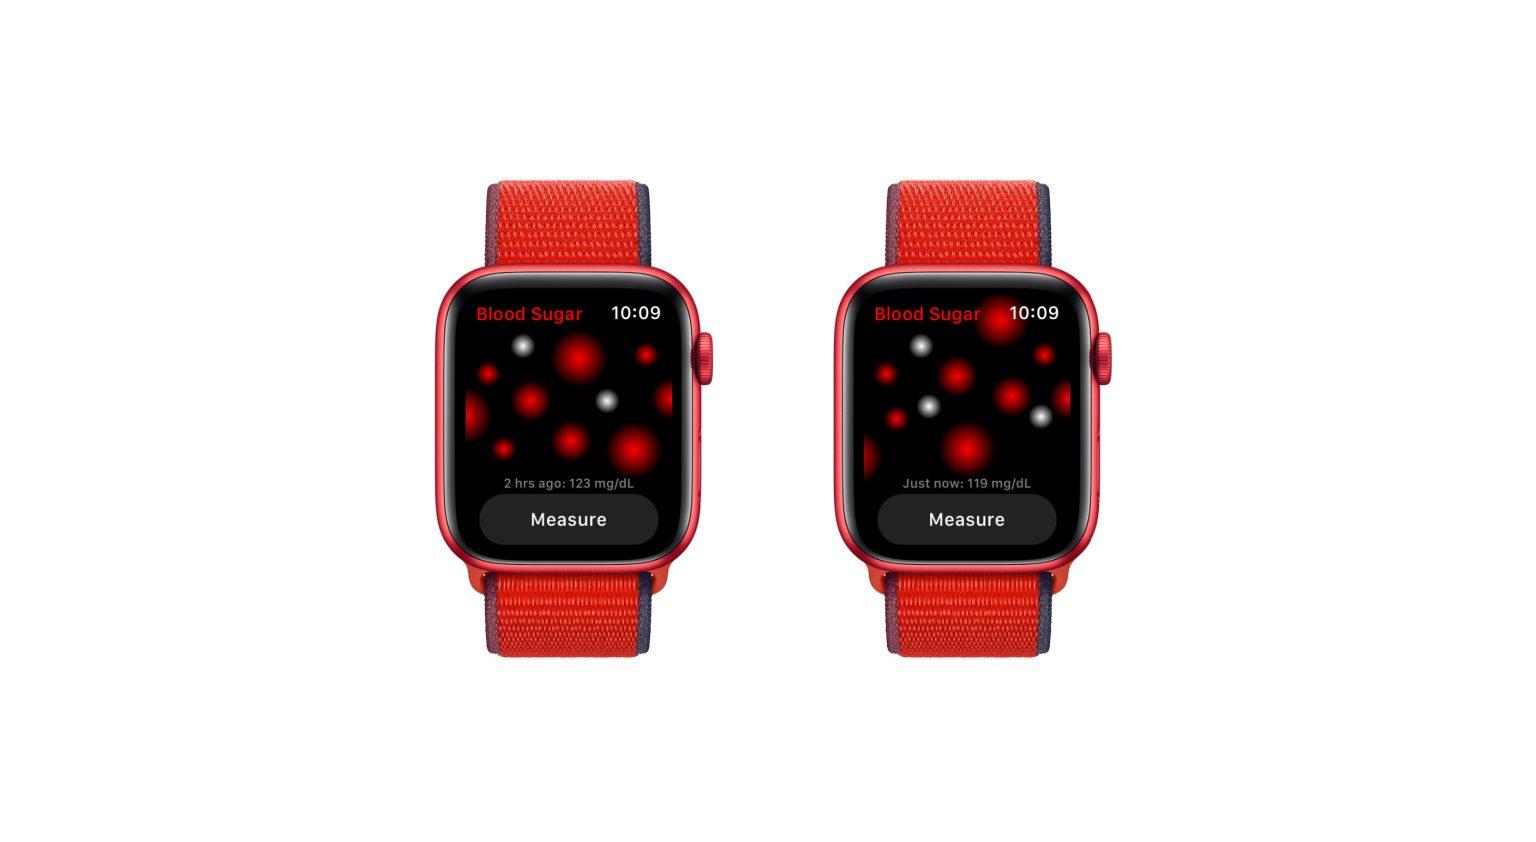 Apple Watch blood sugar levels